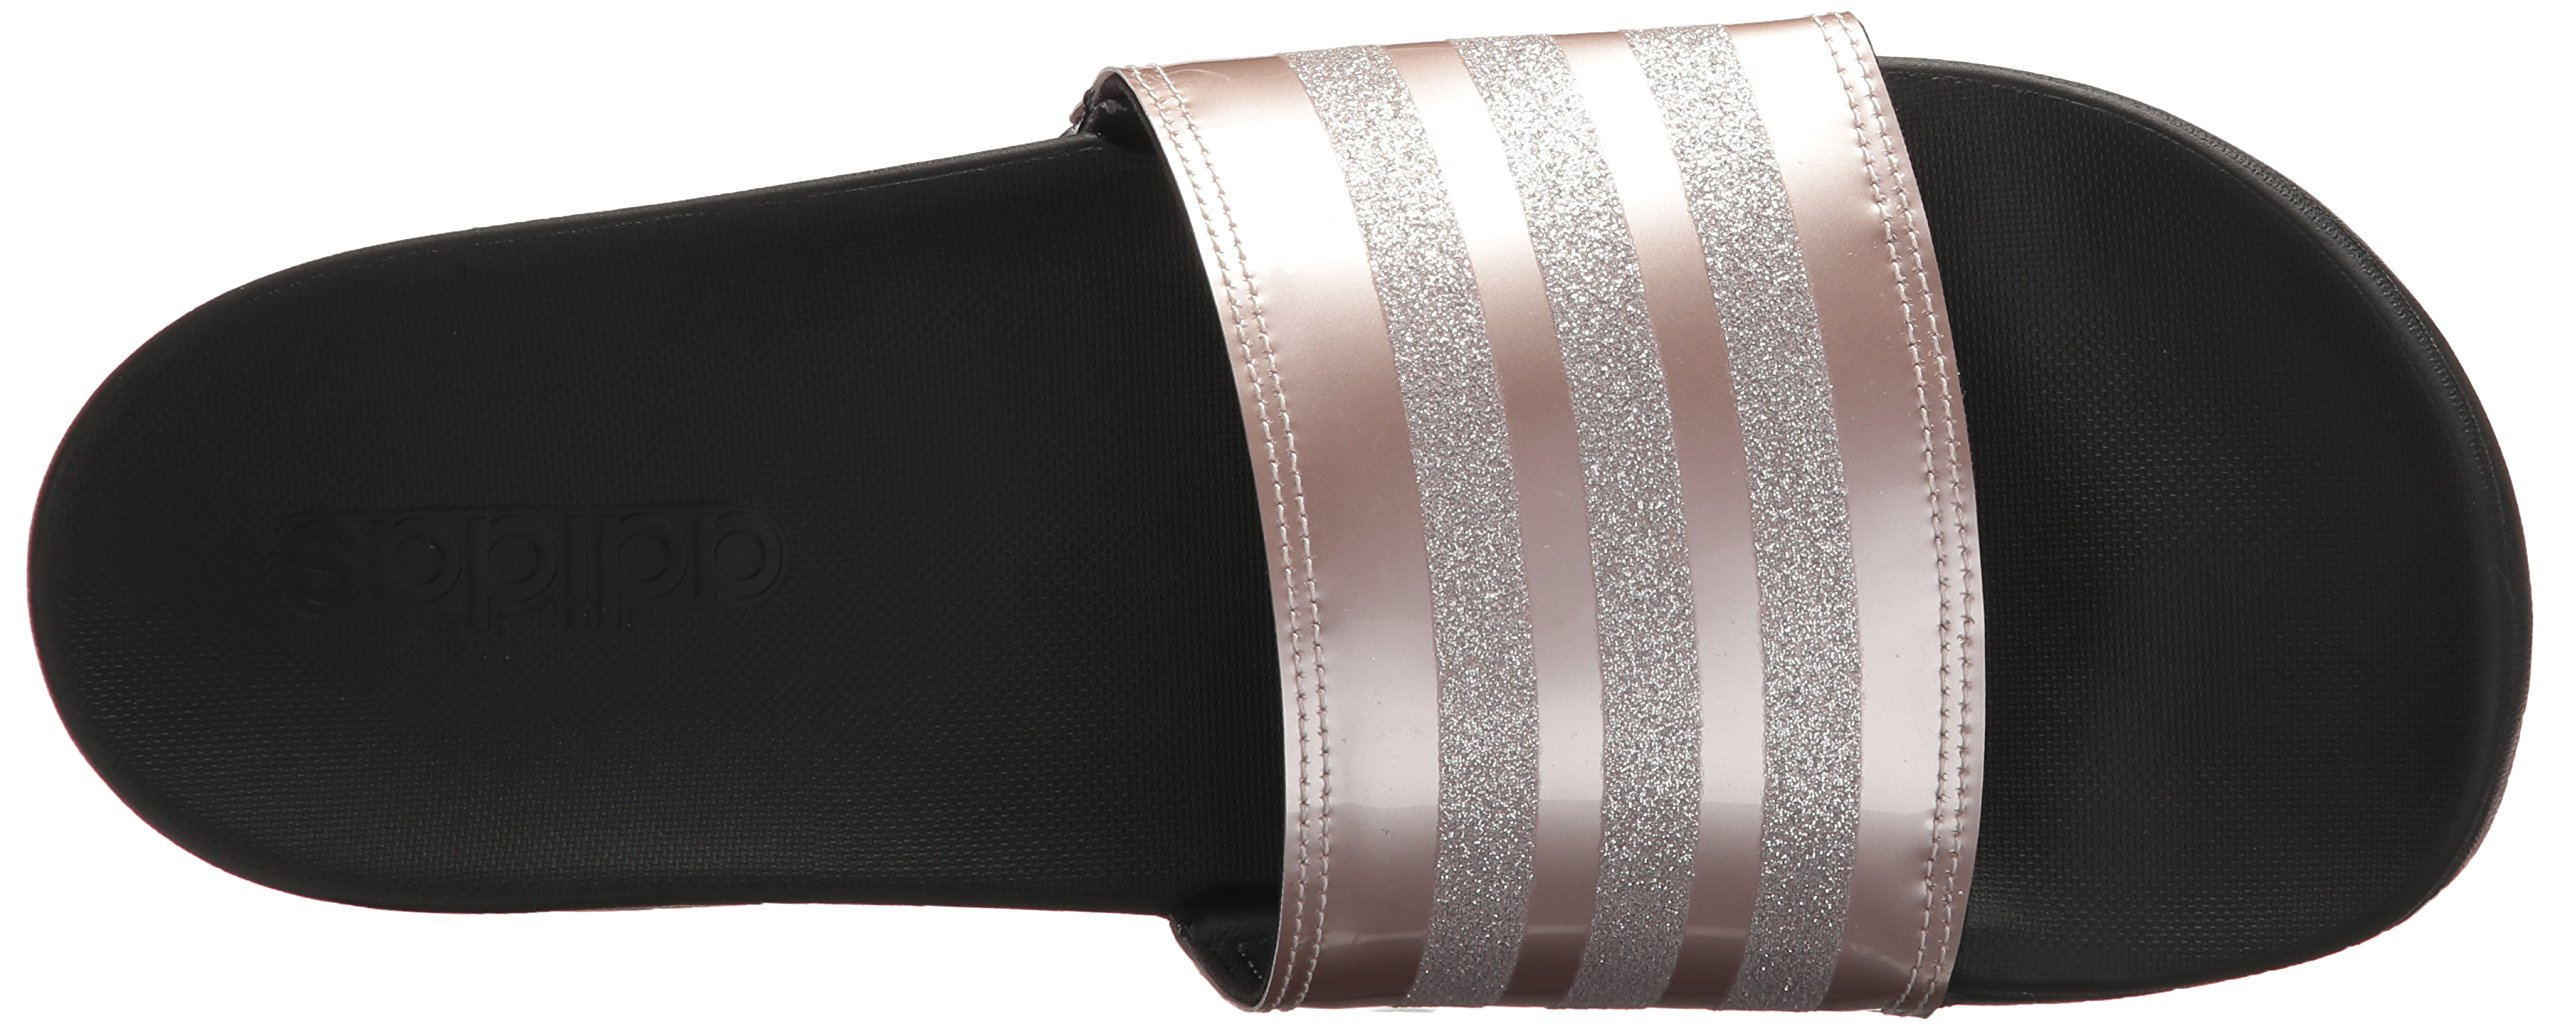 adidas Performance Women's Adilette CF+ Explorer W Sport Sandal, Vapour Grey Met, Vapour Grey Met.Fabric, Core Black, 9 M US by adidas (Image #8)